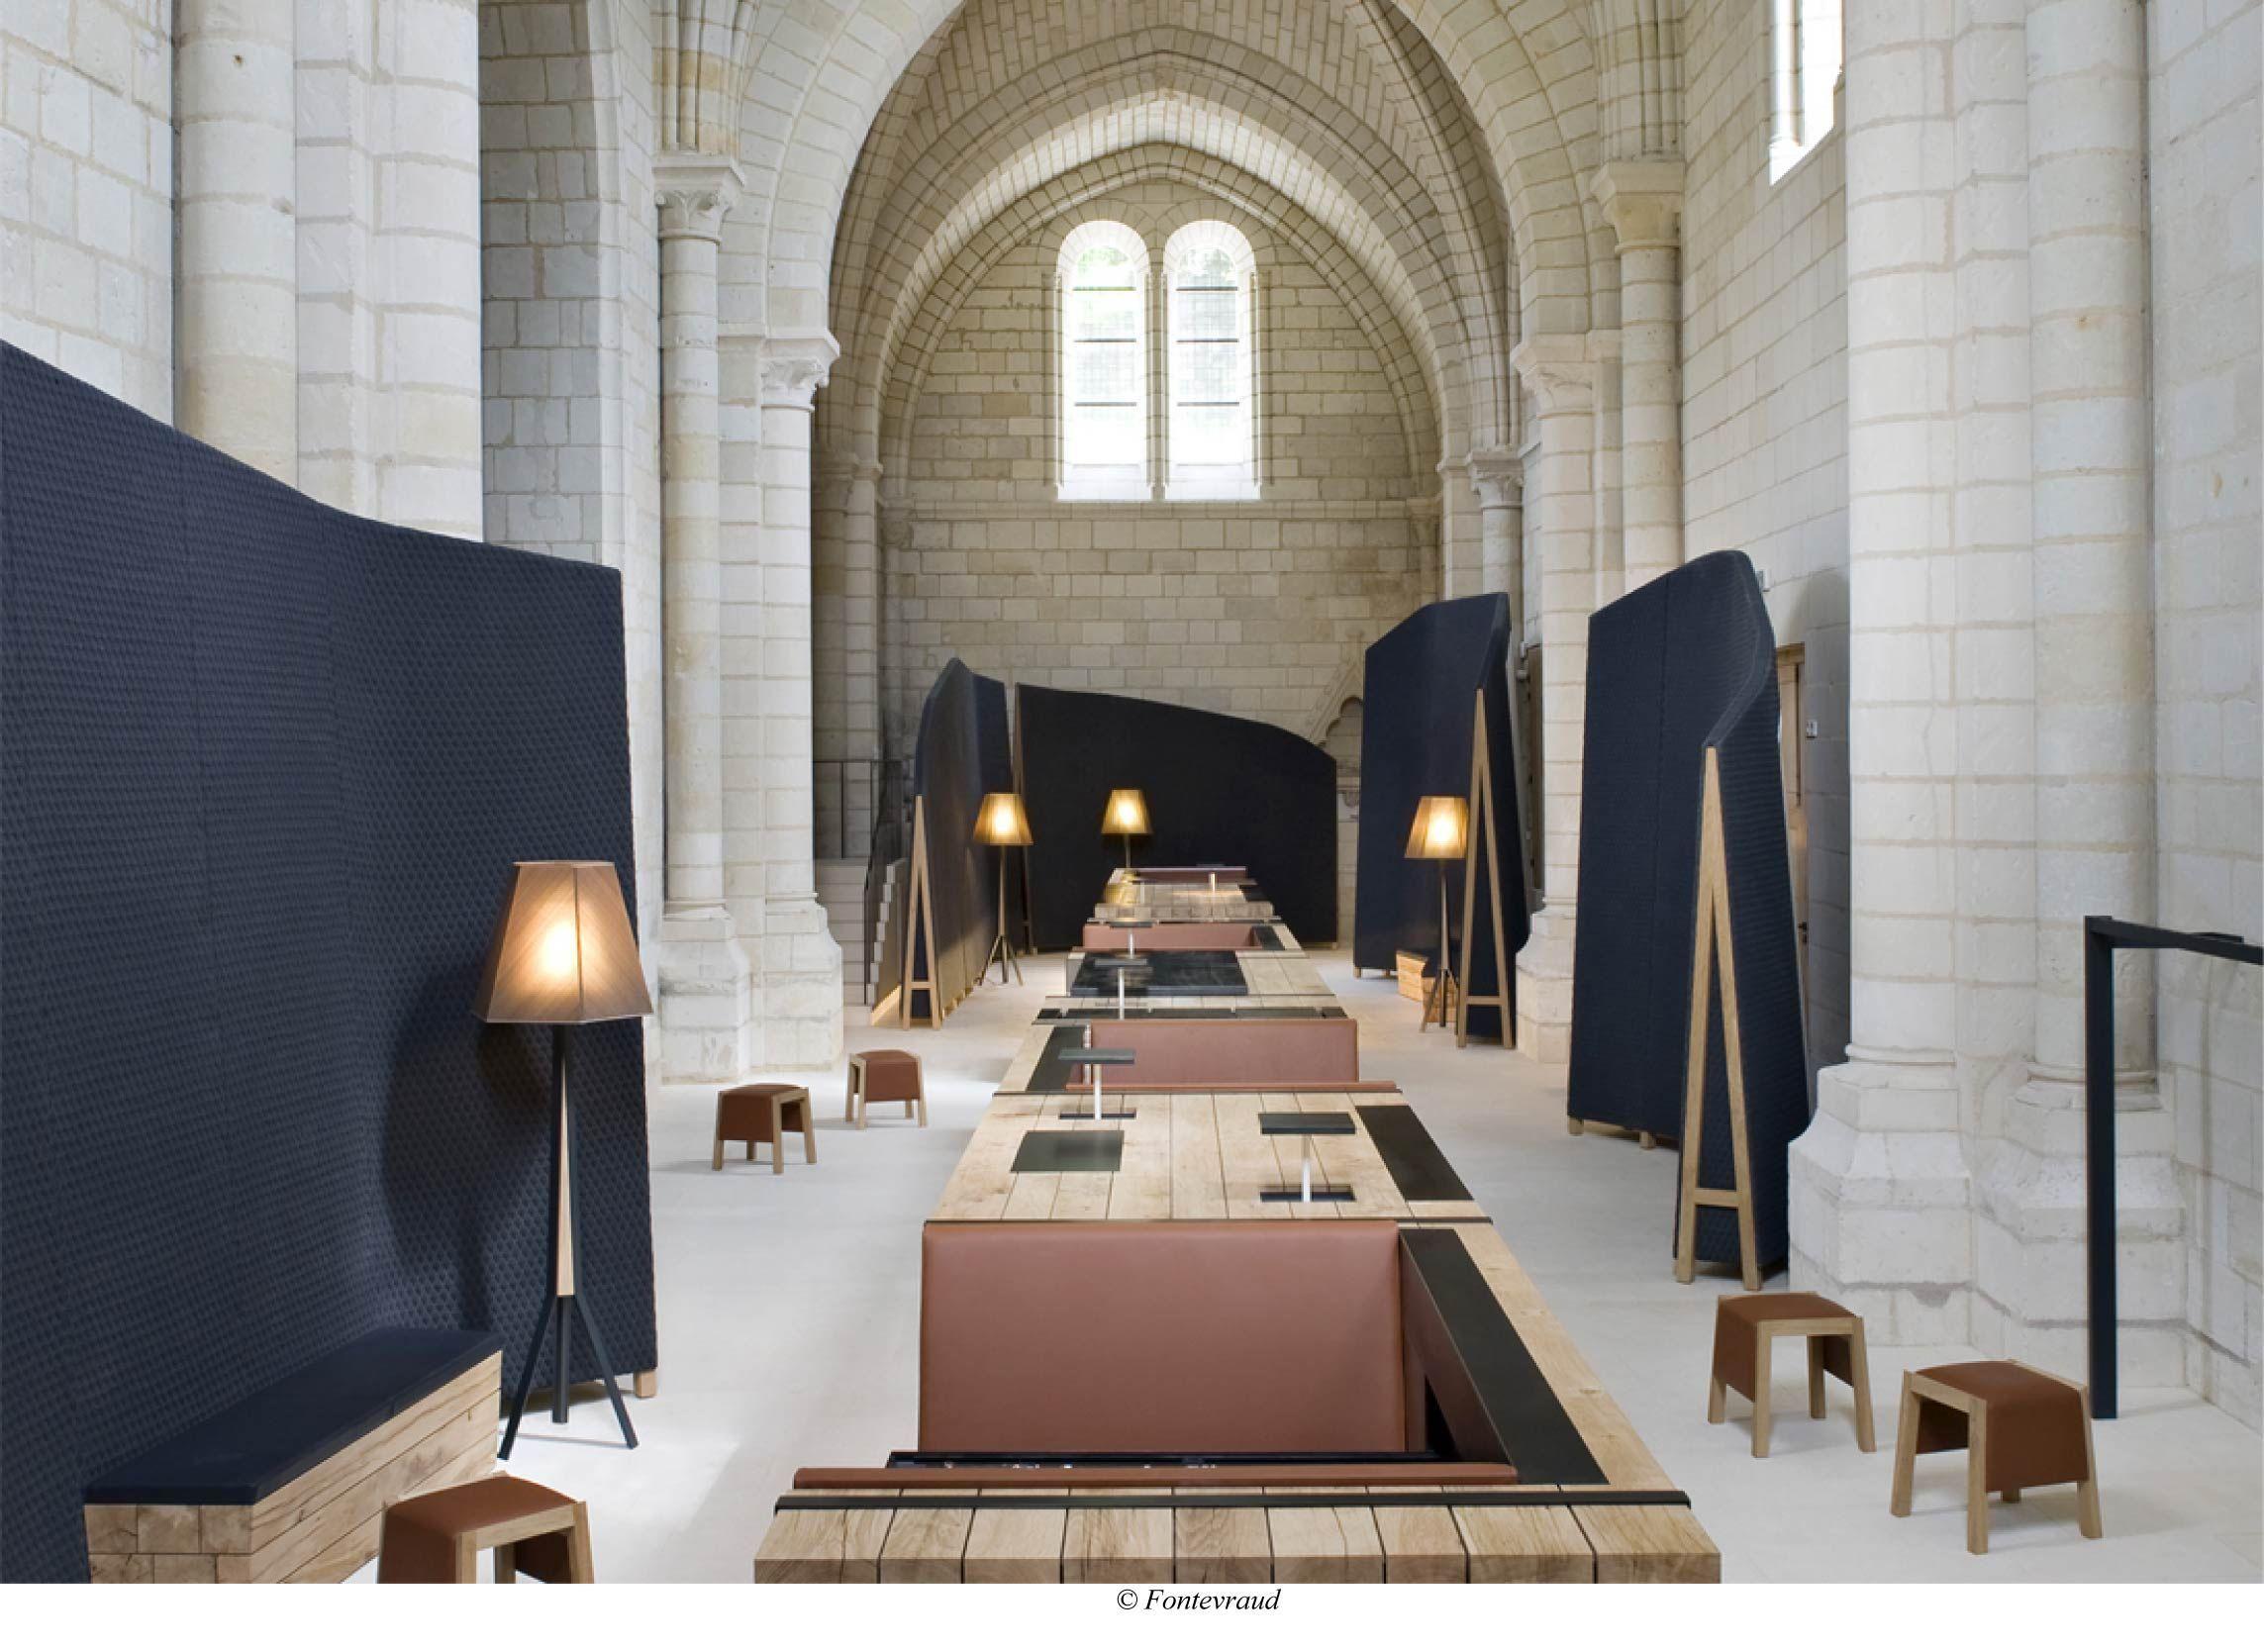 L'Hôtel Fontevraud-l'Abbaye